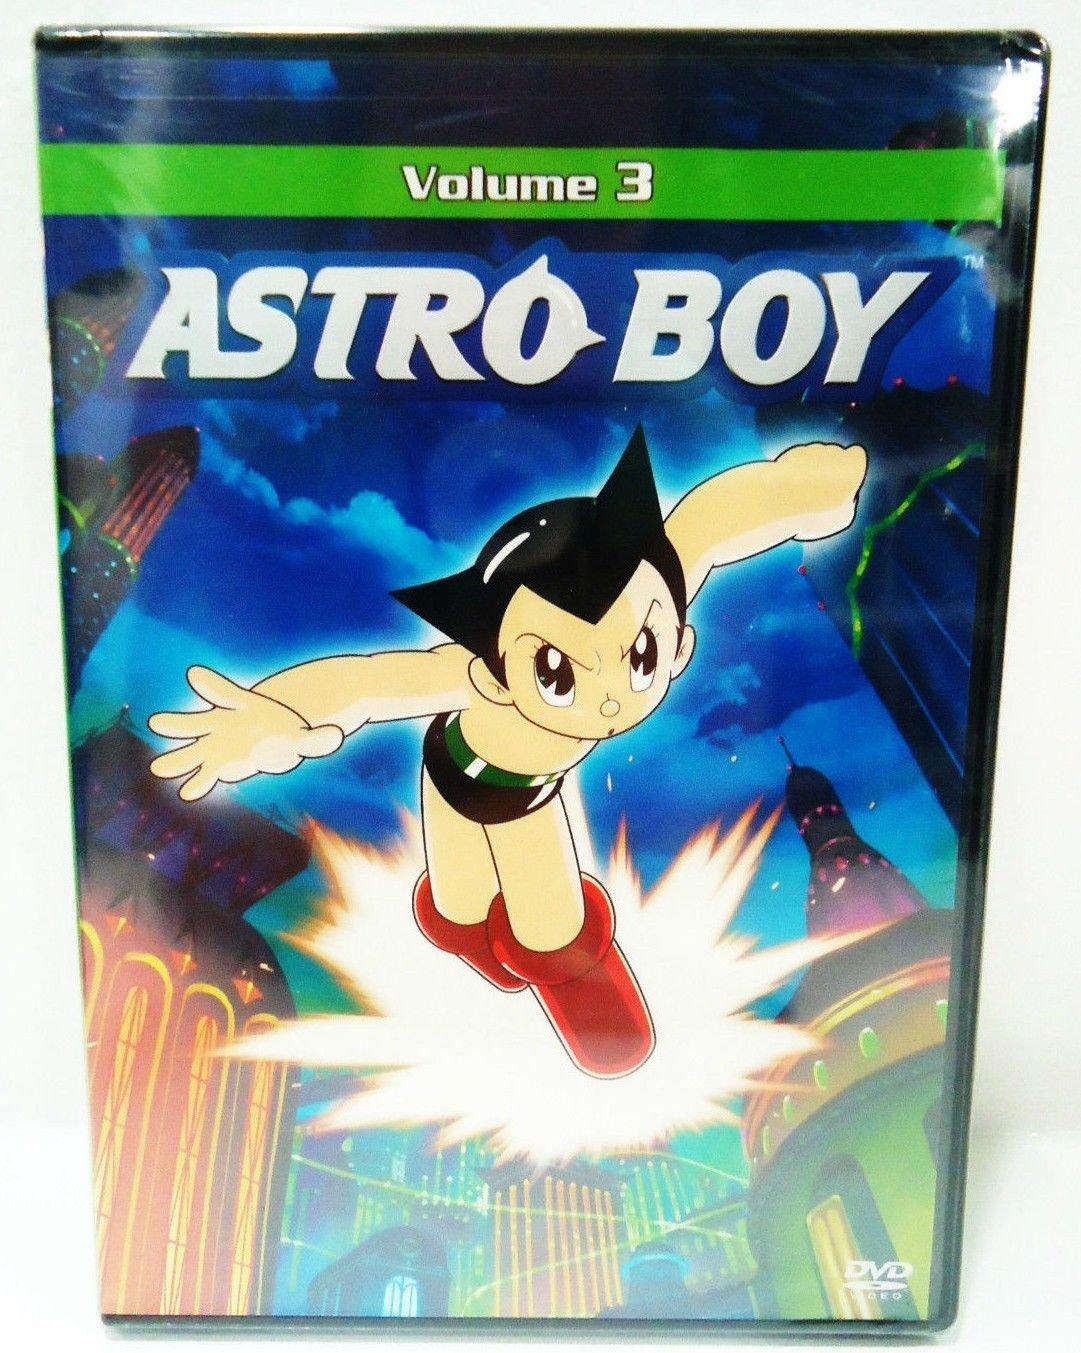 ASTRO BOY - VOLUME 3 - DVD - VINTAGE - COMIC - CARTOON - NEW - JAPANESE - ANIME